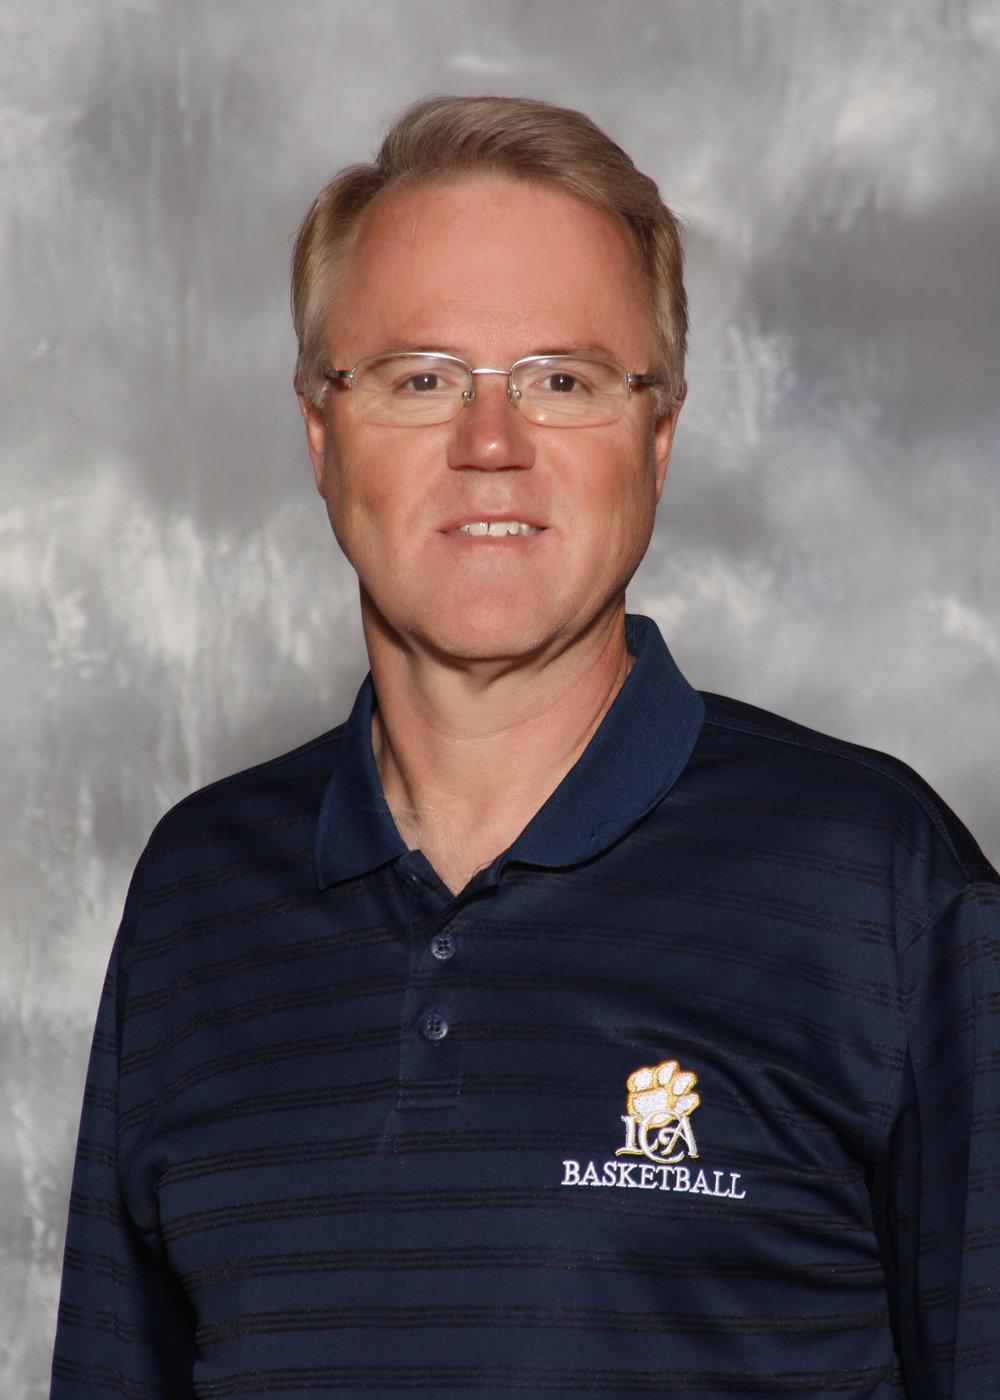 Mark Davis, named Walton Tribune Coach of the Year